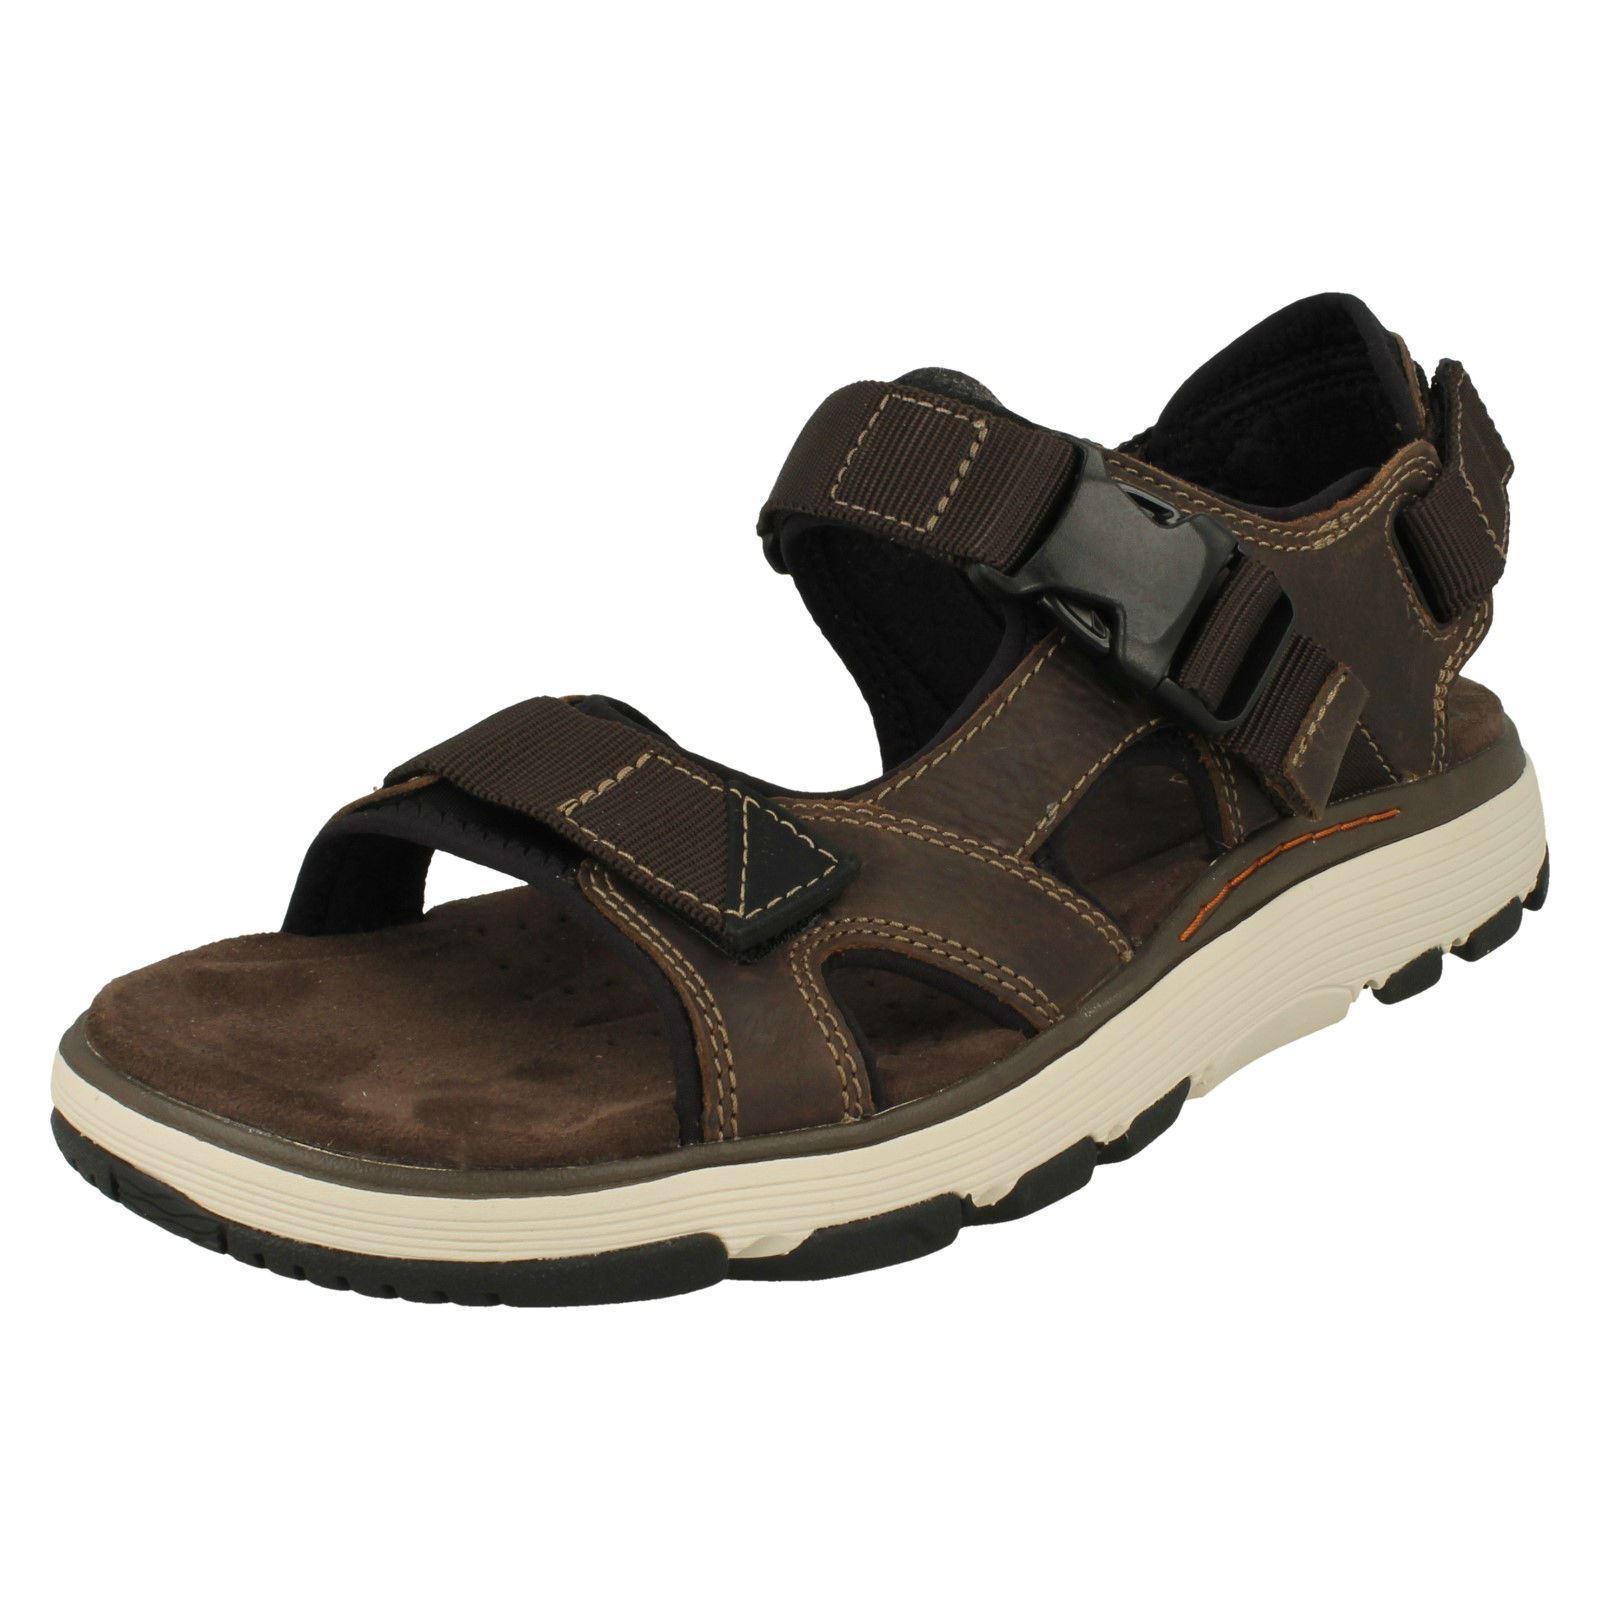 Mens Clarks Strapped Sandals - Un Trek Bar